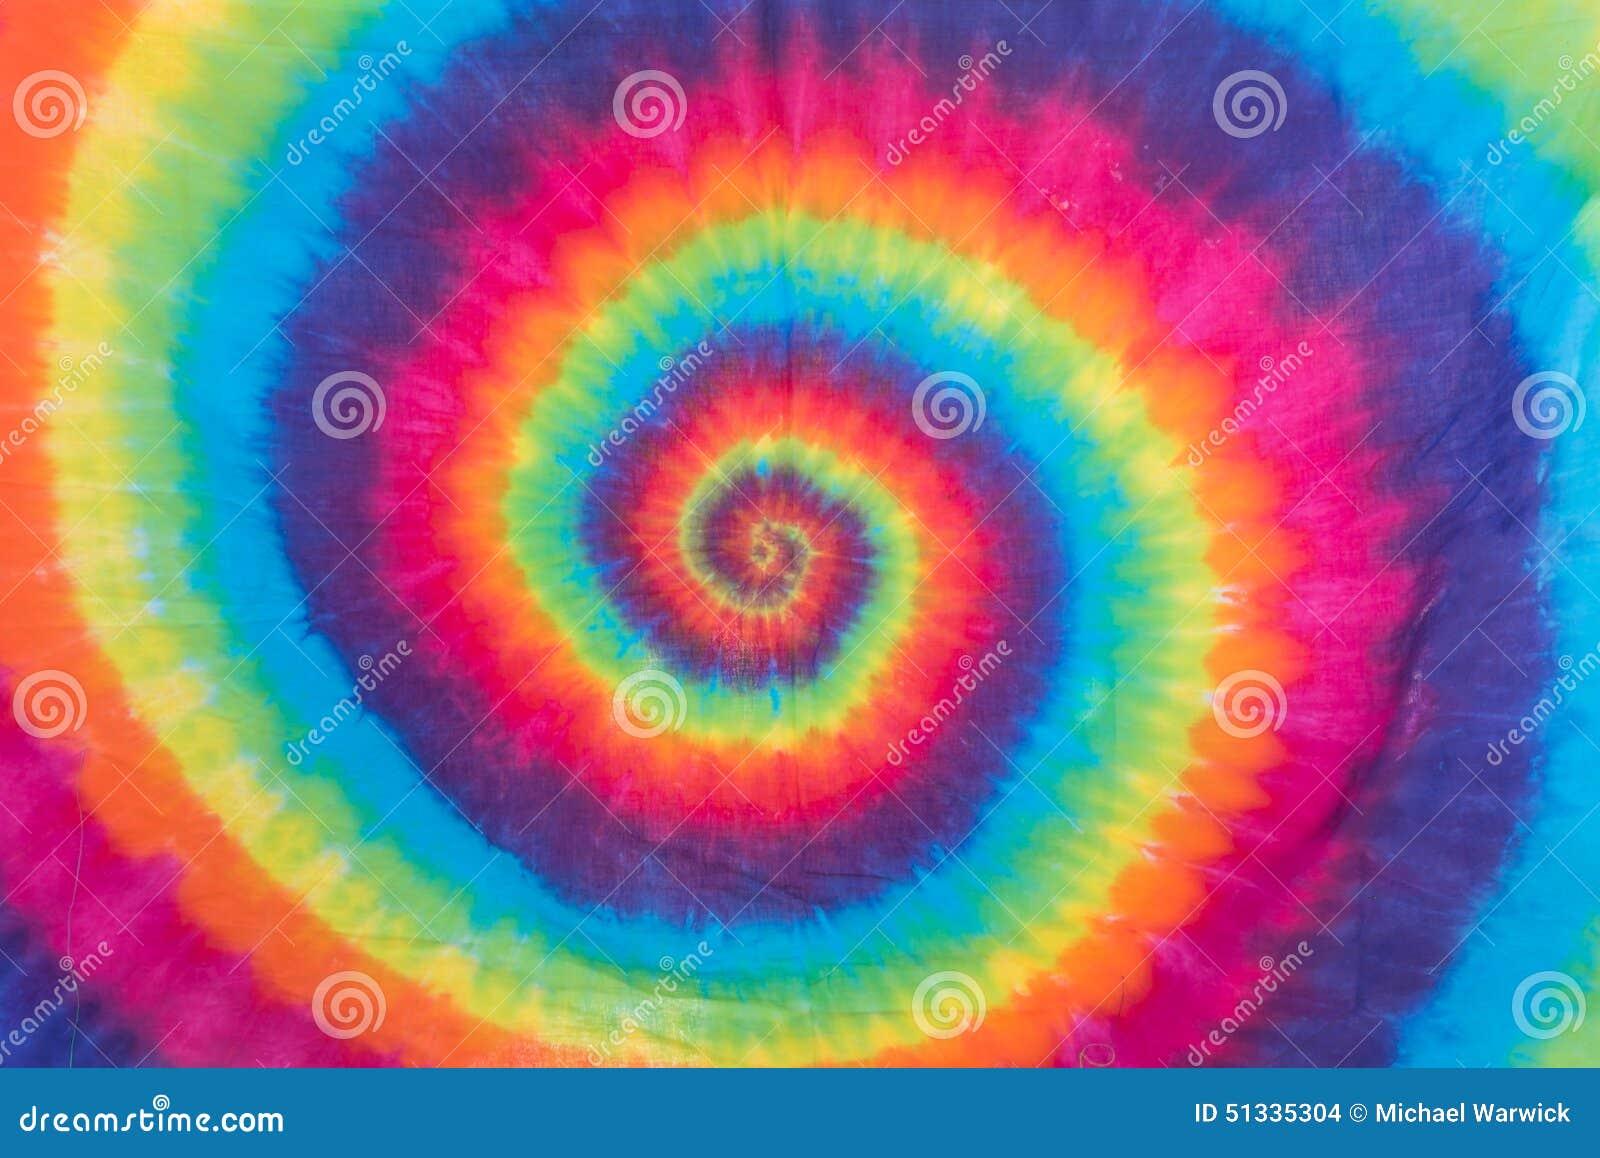 Colorful Tie Dye Spiral Pattern Design